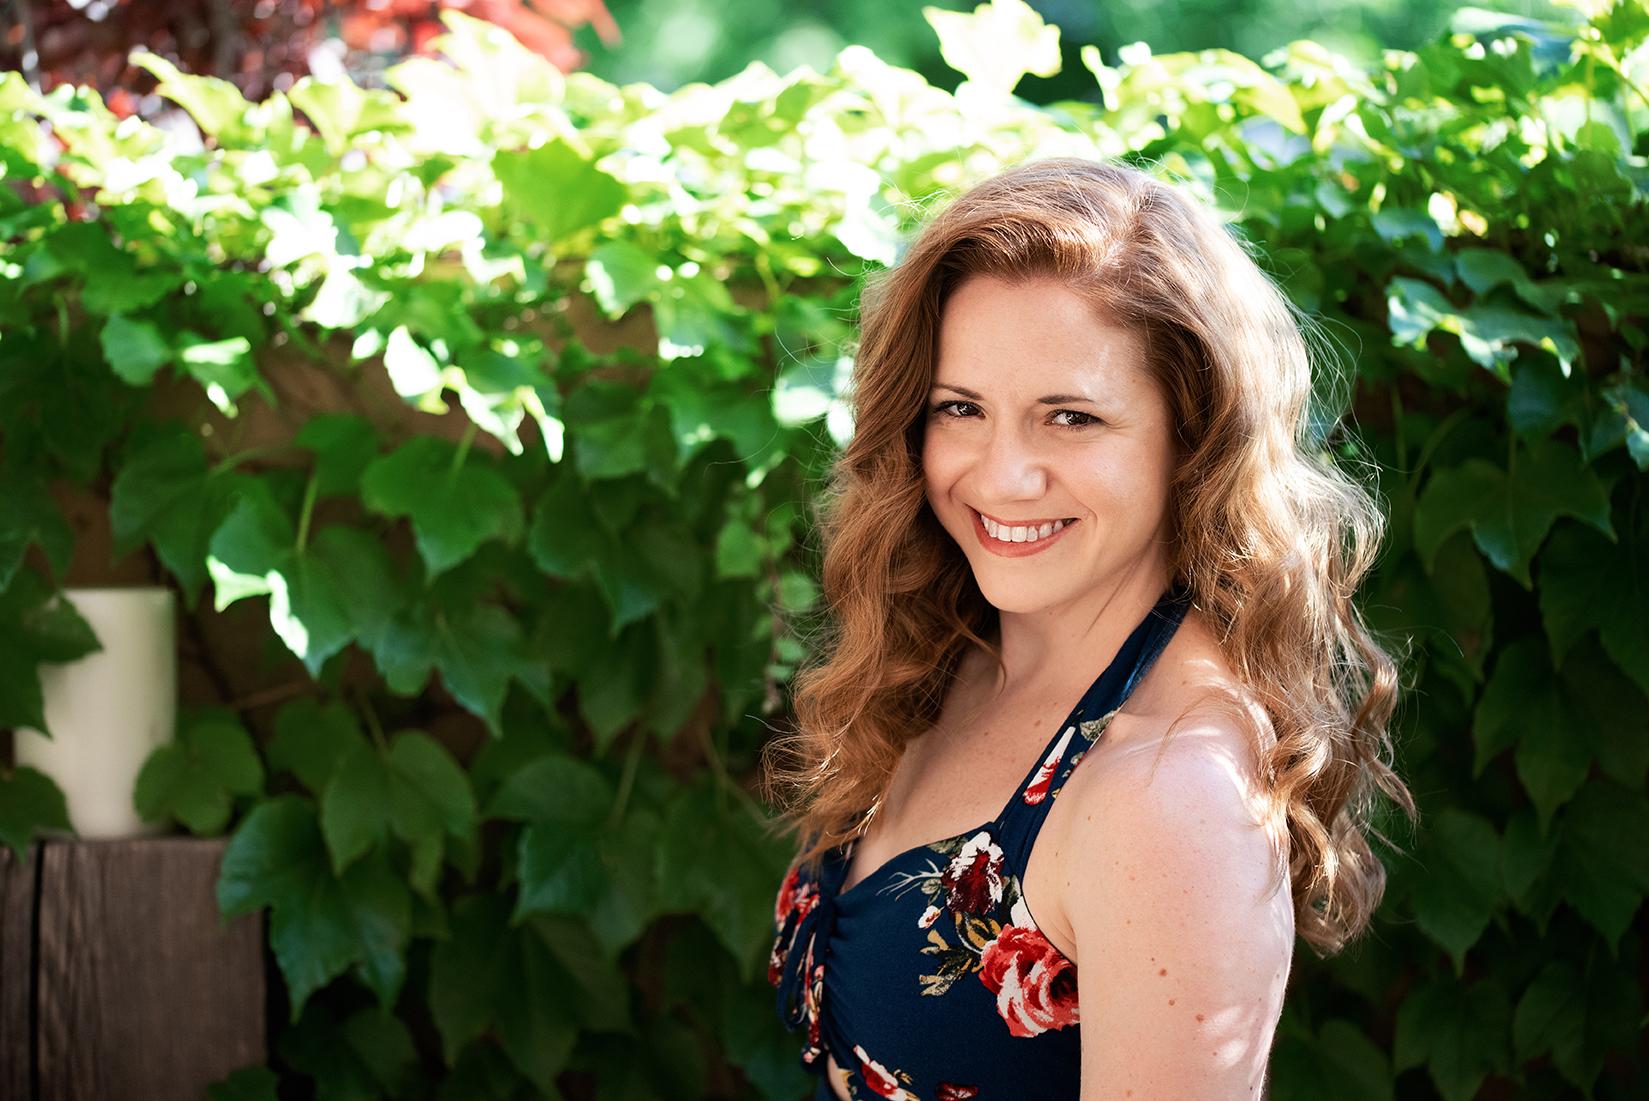 Sara Exley Santa Fe New Mexico Professional Business Portrait Headshot Head Shot Photography Photographer.jpg